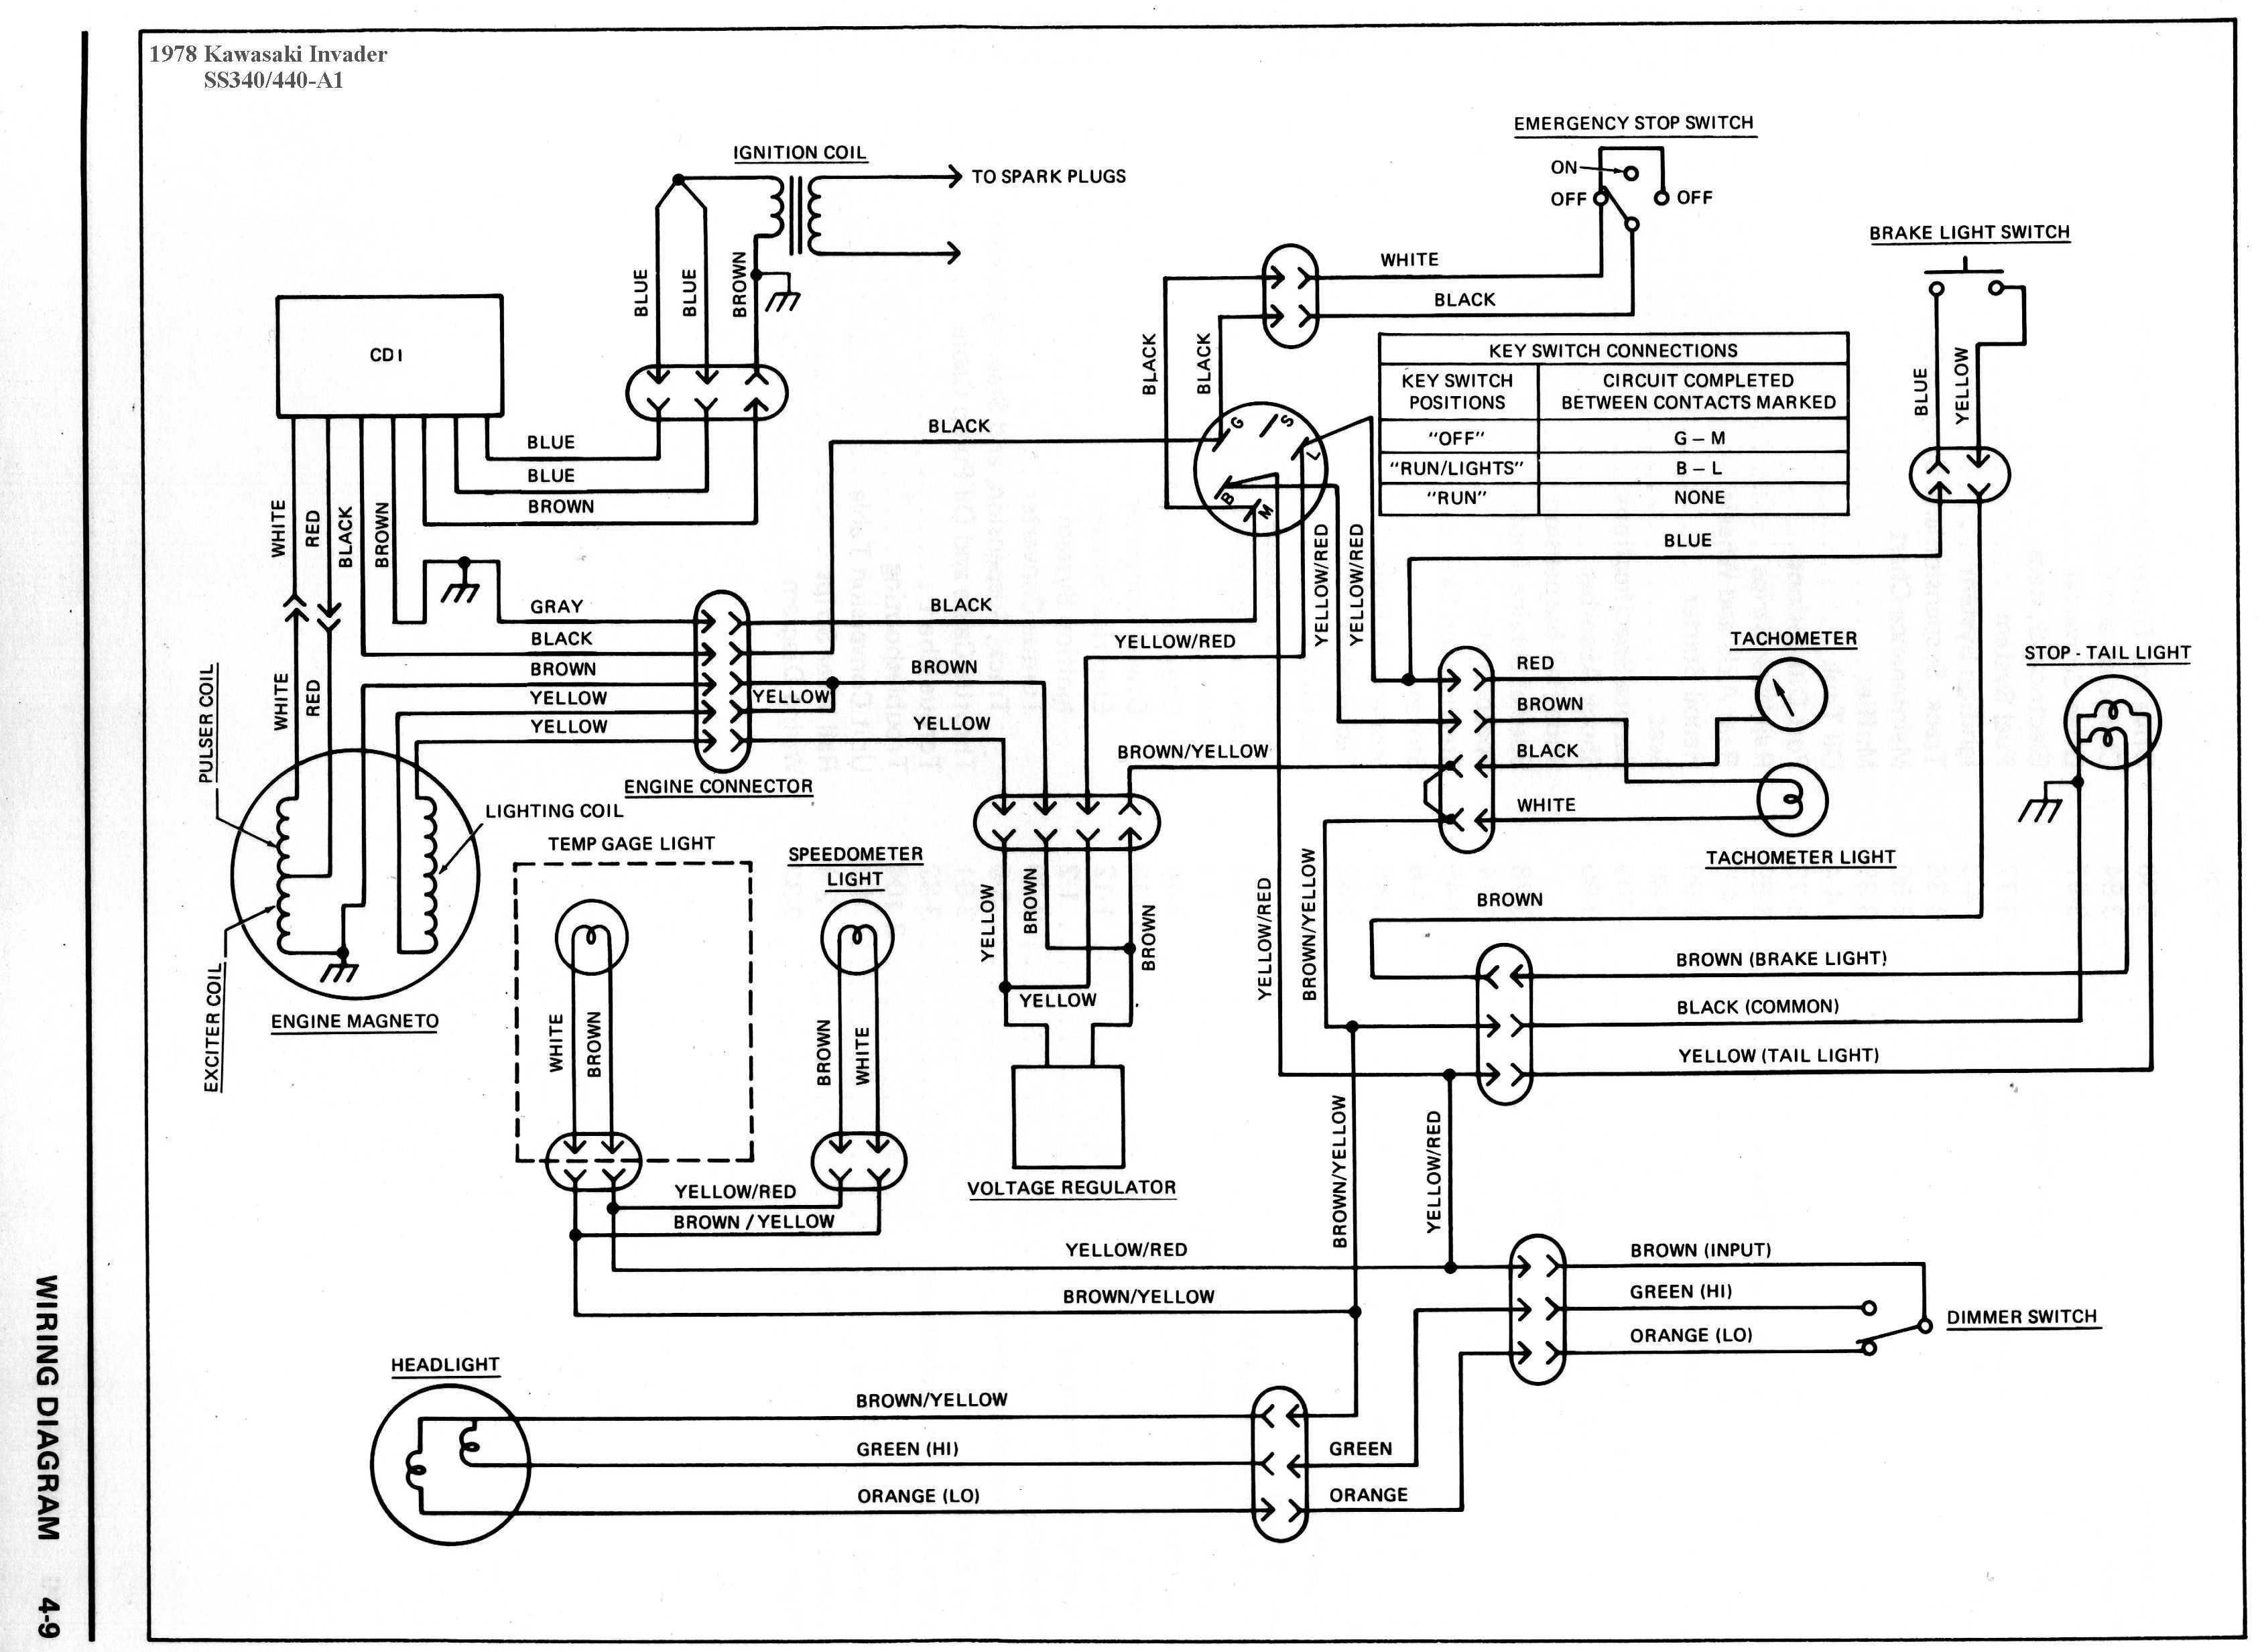 Kawasaki Bayou 220 Wiring Schematic | Free Wiring Diagram